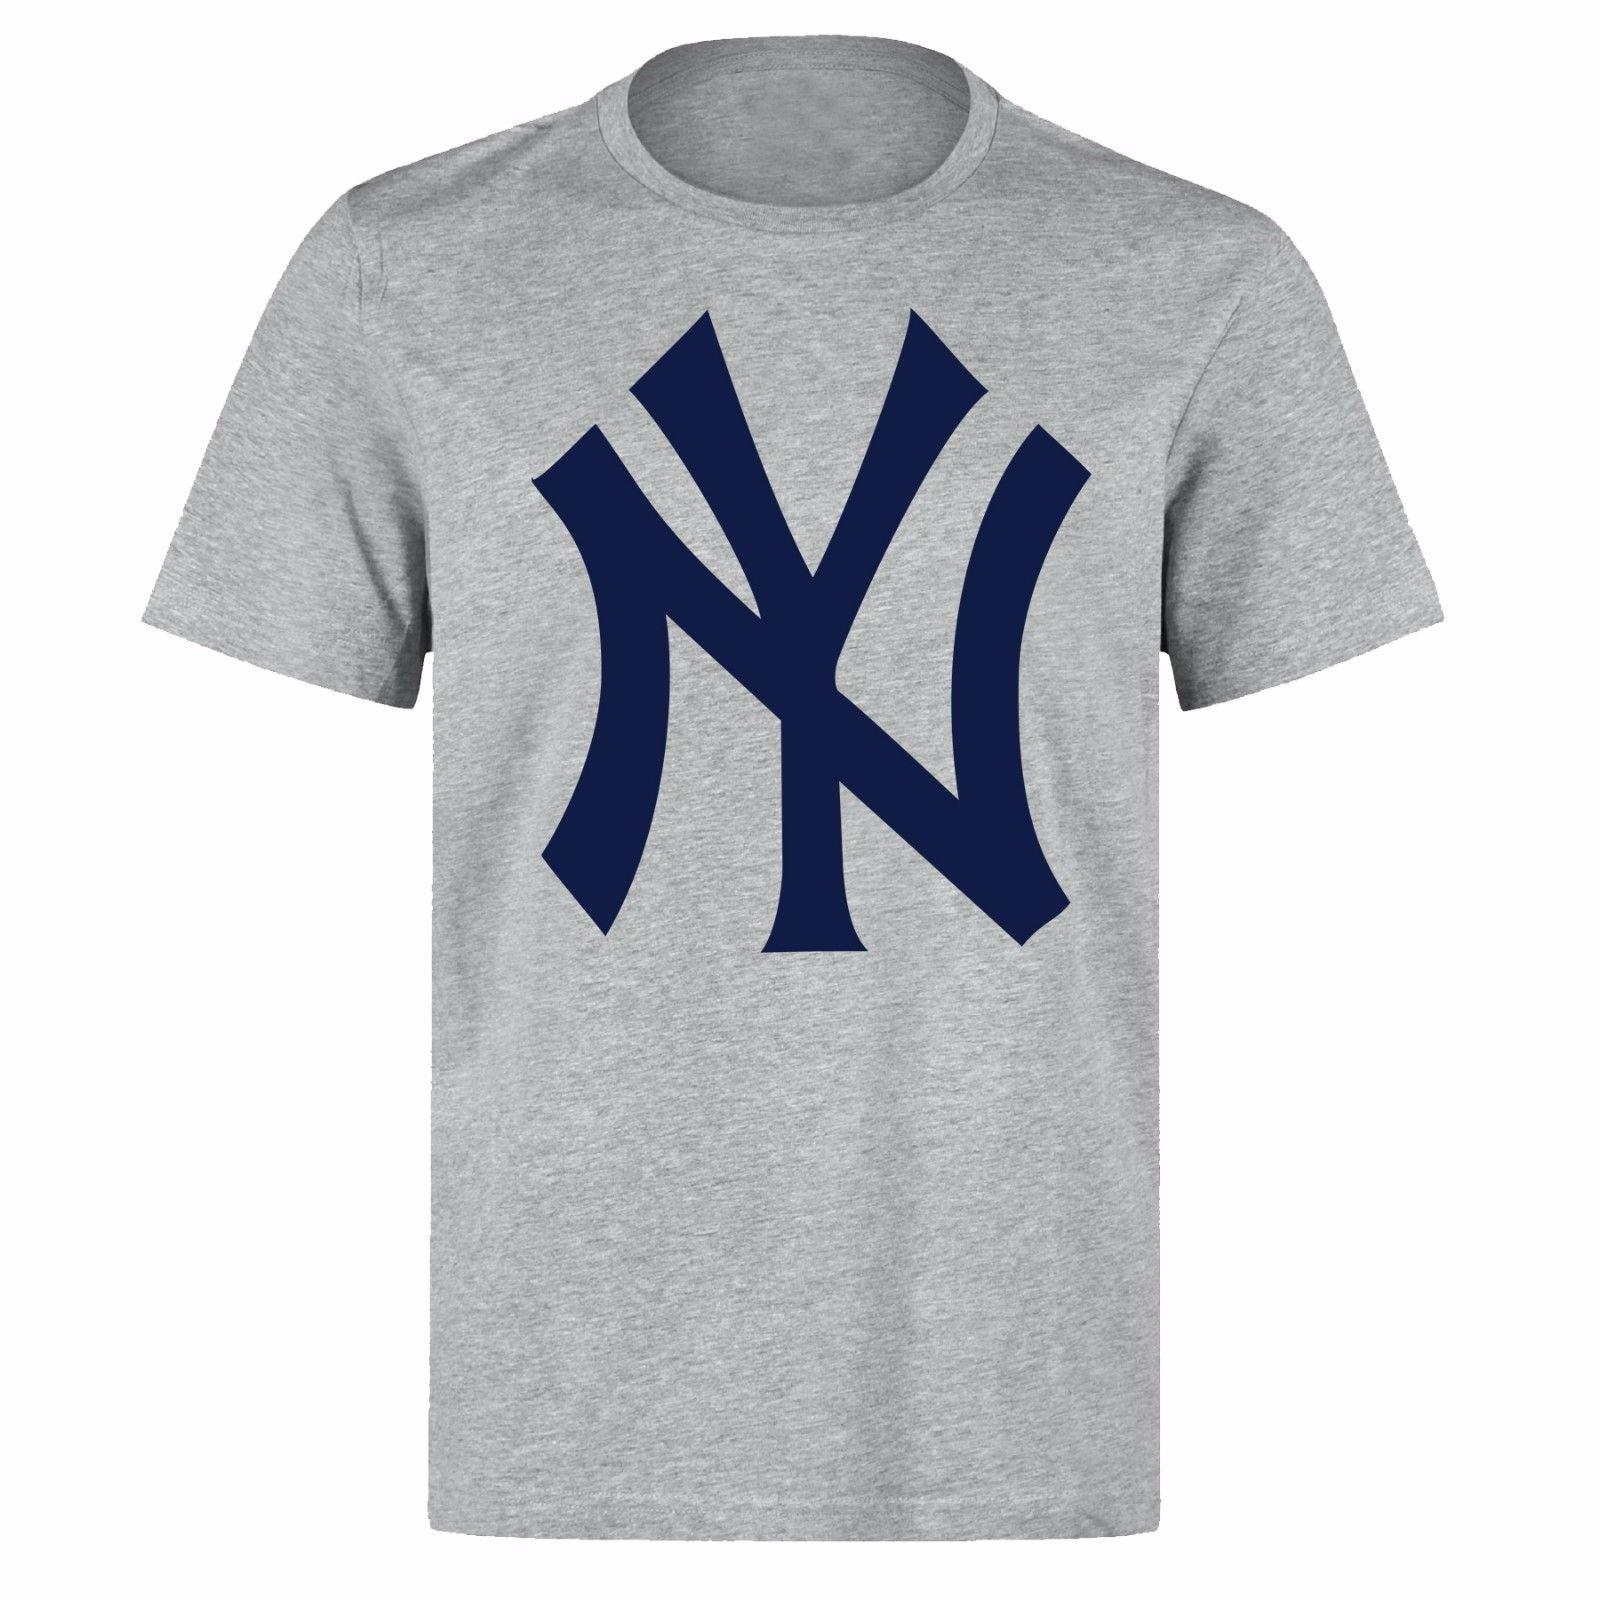 1ed0bfd01abdd Compre NY NEW YORK YANKEES MLB BÉISBOL EQUIPO LOGO UNISEX ROPA A  12.05 Del  Xsy13tshirt